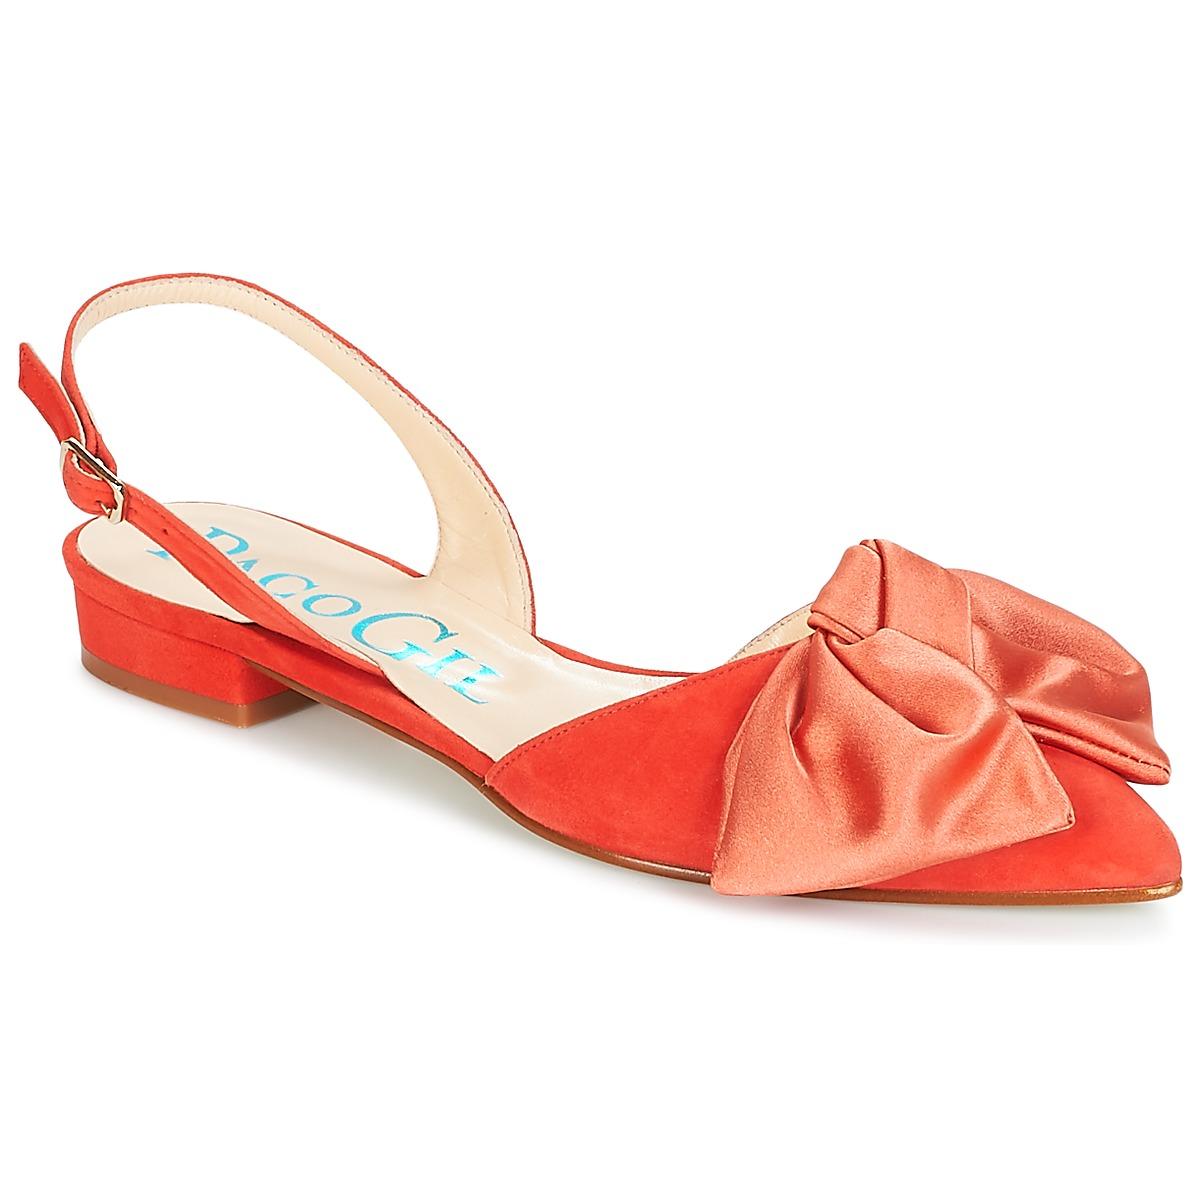 Paco Gil MARIE TOFLEX Rot - Kostenloser Versand bei Spartoode ! - Schuhe Sandalen / Sandaletten Damen 132,00 €